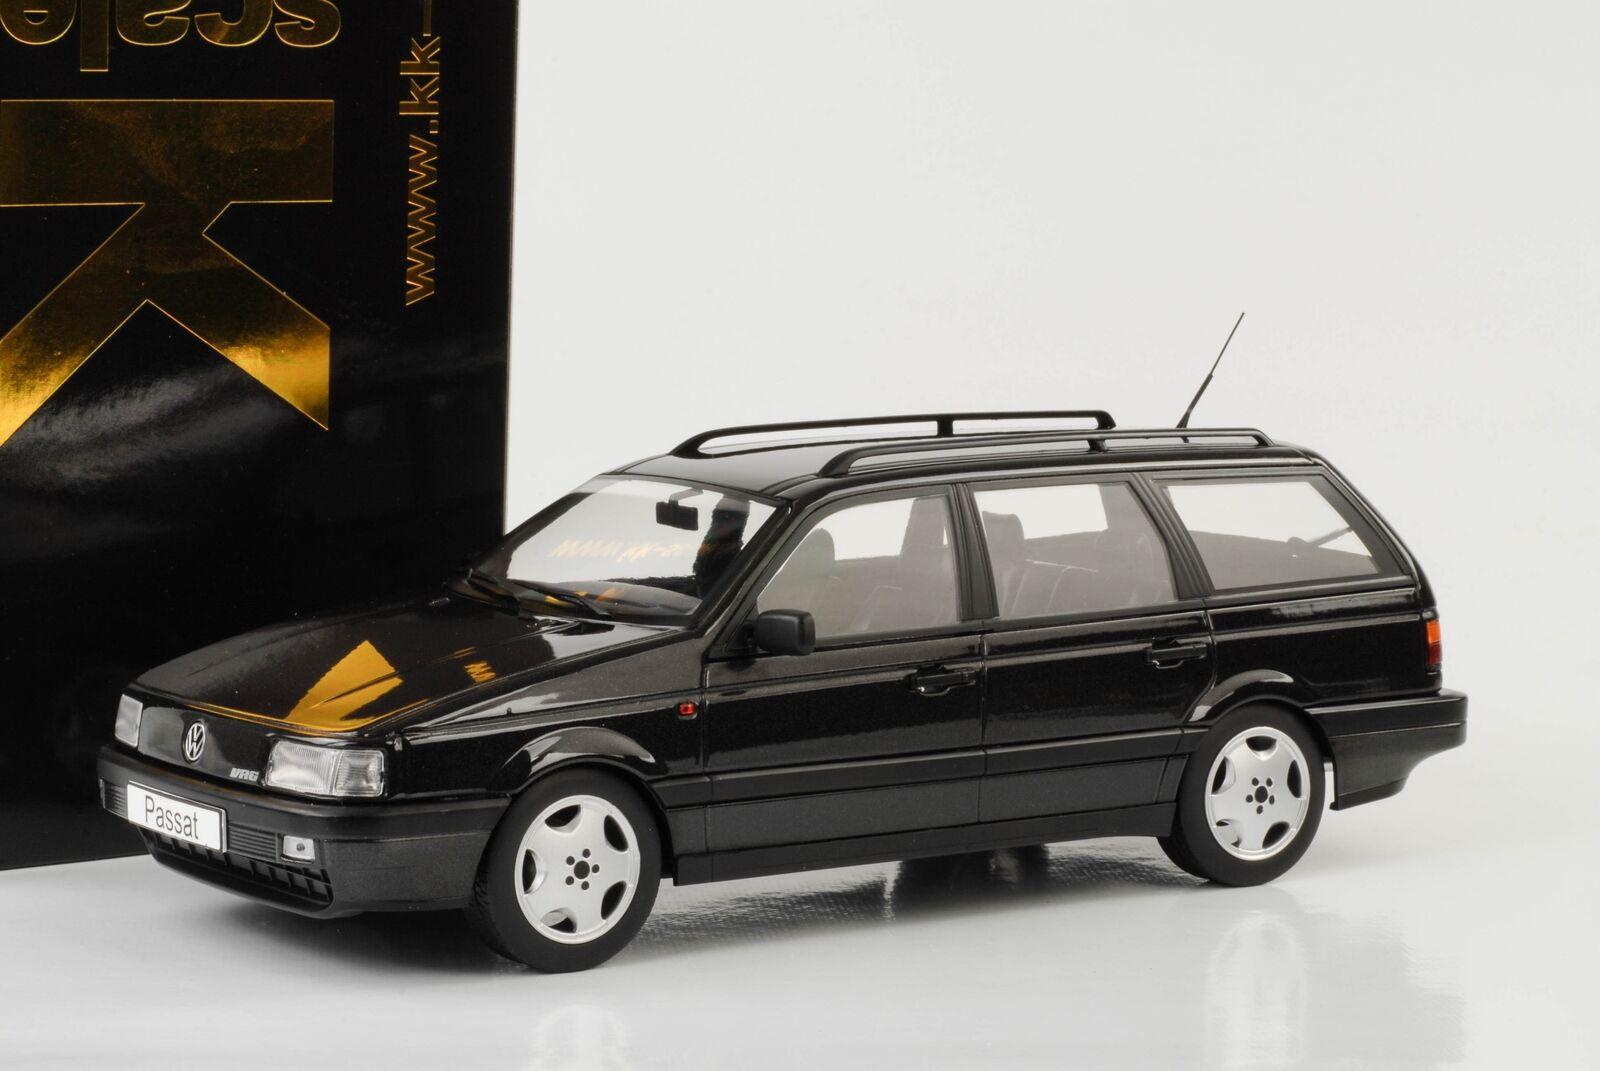 1988 Volkswagen VW Passat b3 vr6 Variant negro metálico 1 18 KK